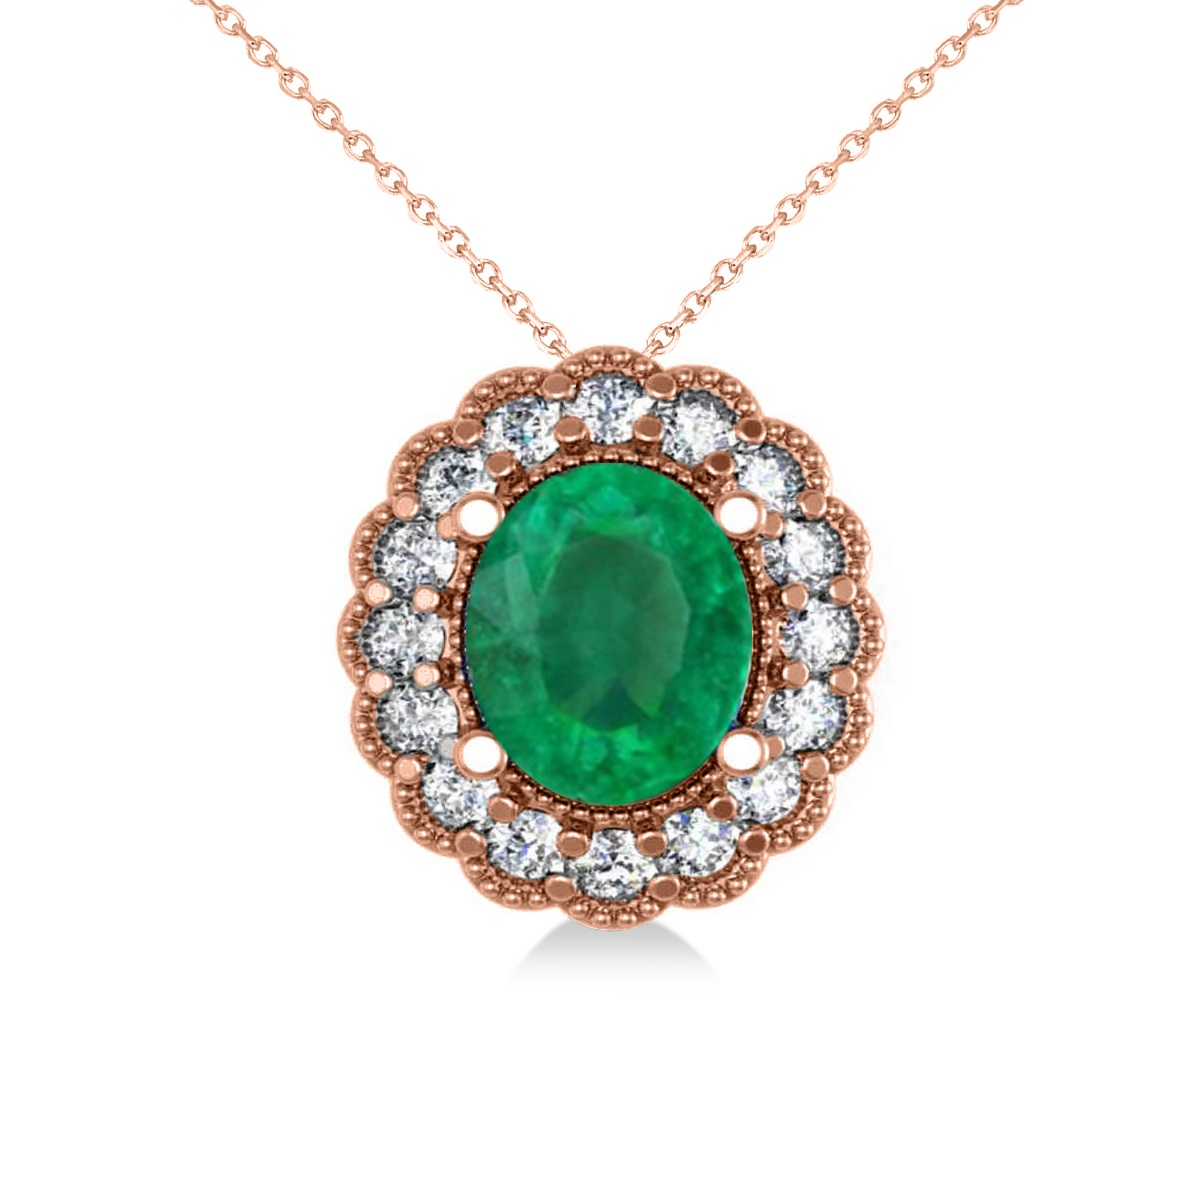 Emerald & Diamond Floral Oval Pendant Necklace 14k Rose Gold (2.98ct)